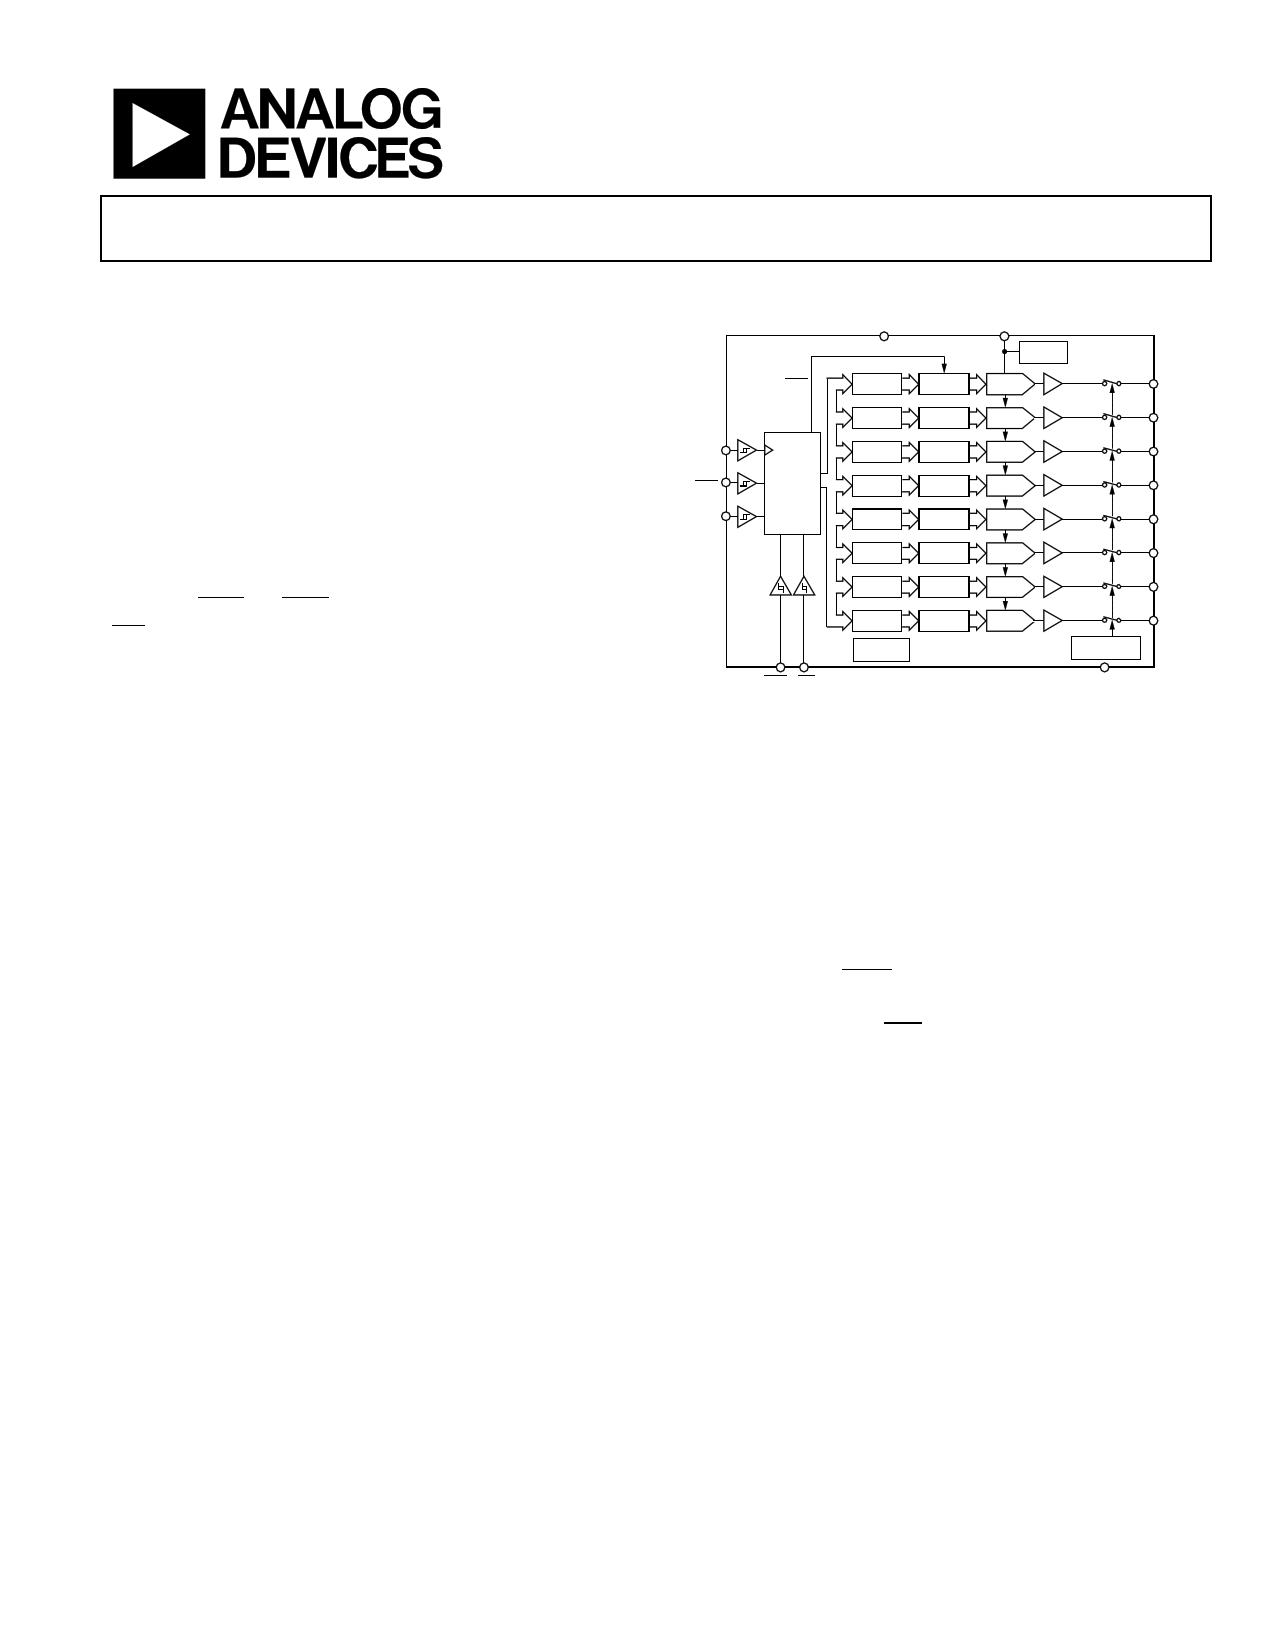 AD5668 datasheet